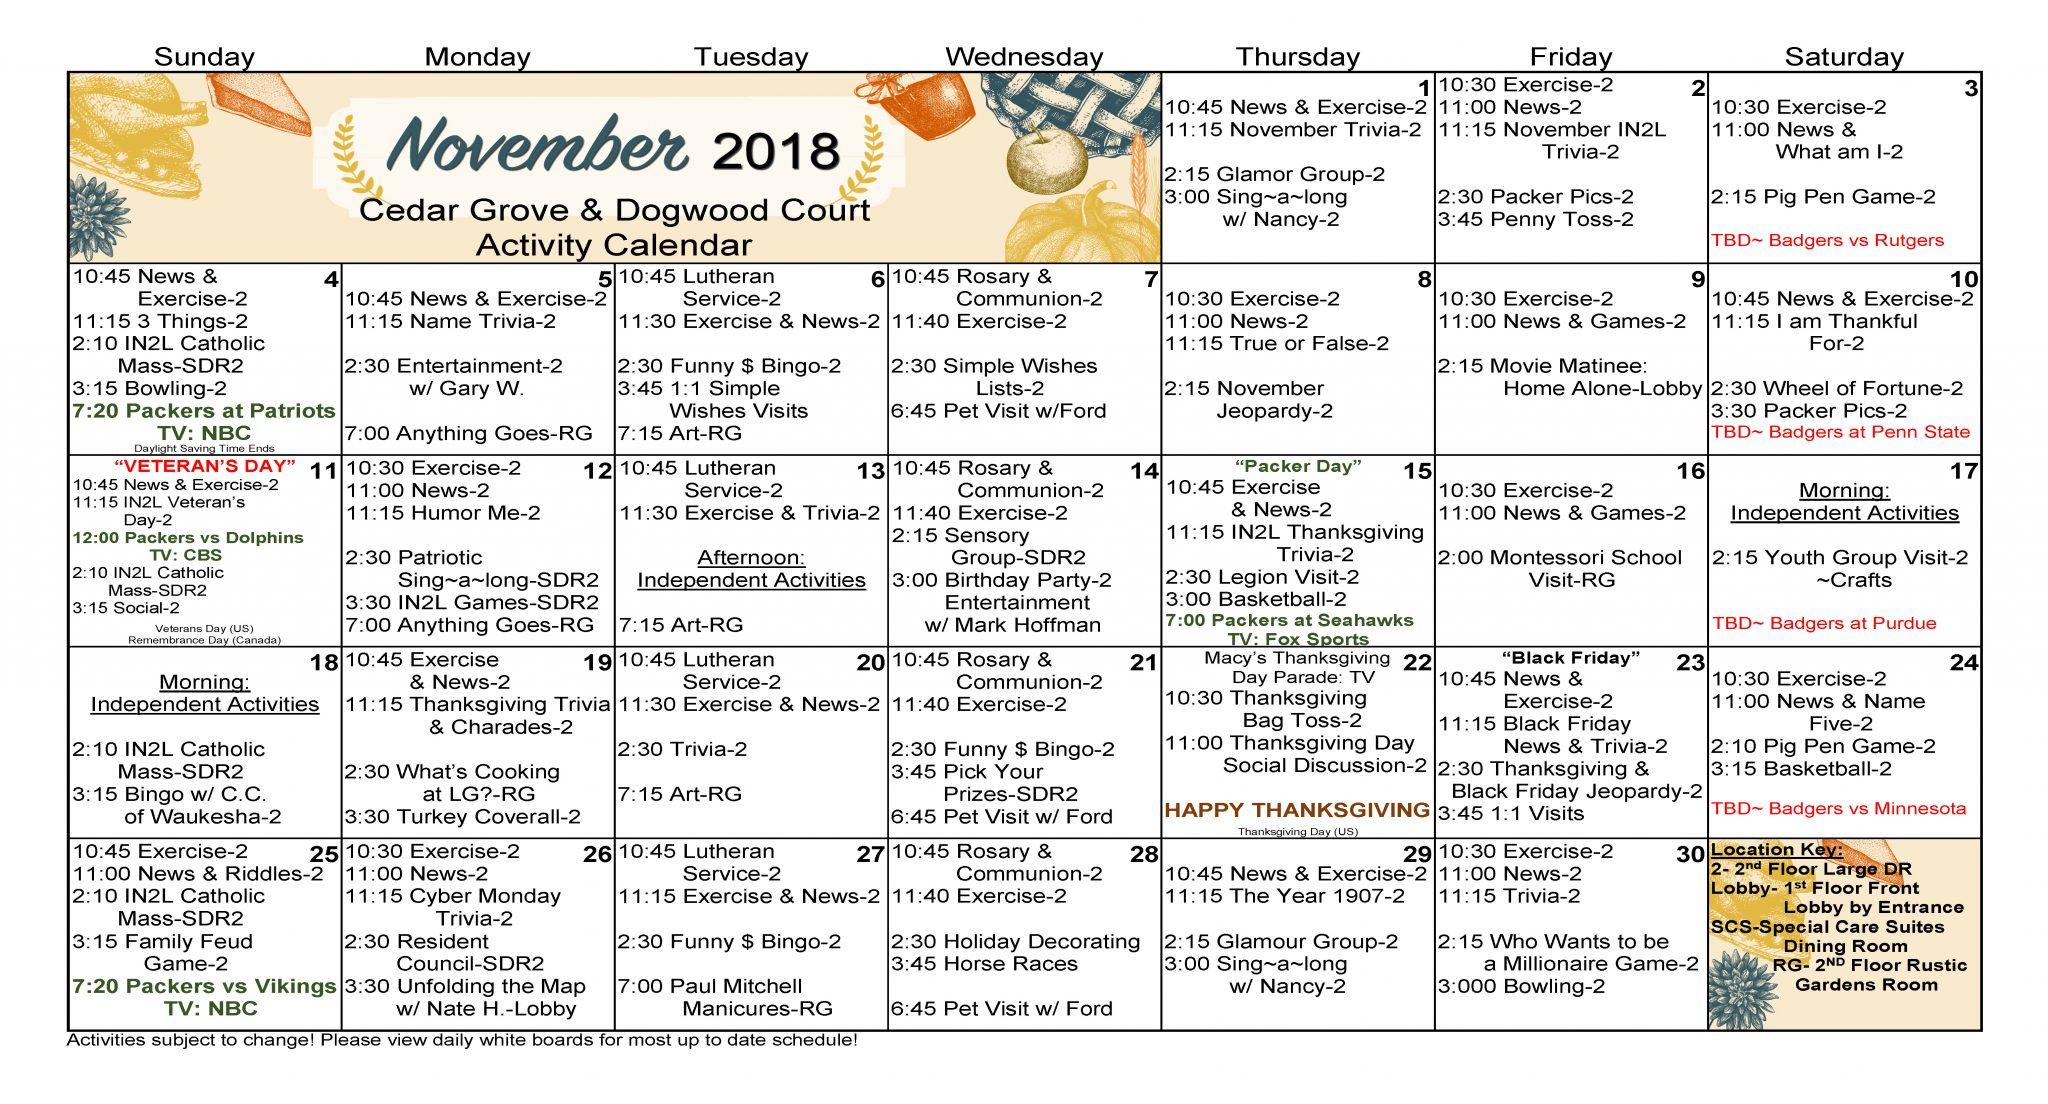 WK CDR DGWD Nov 2018